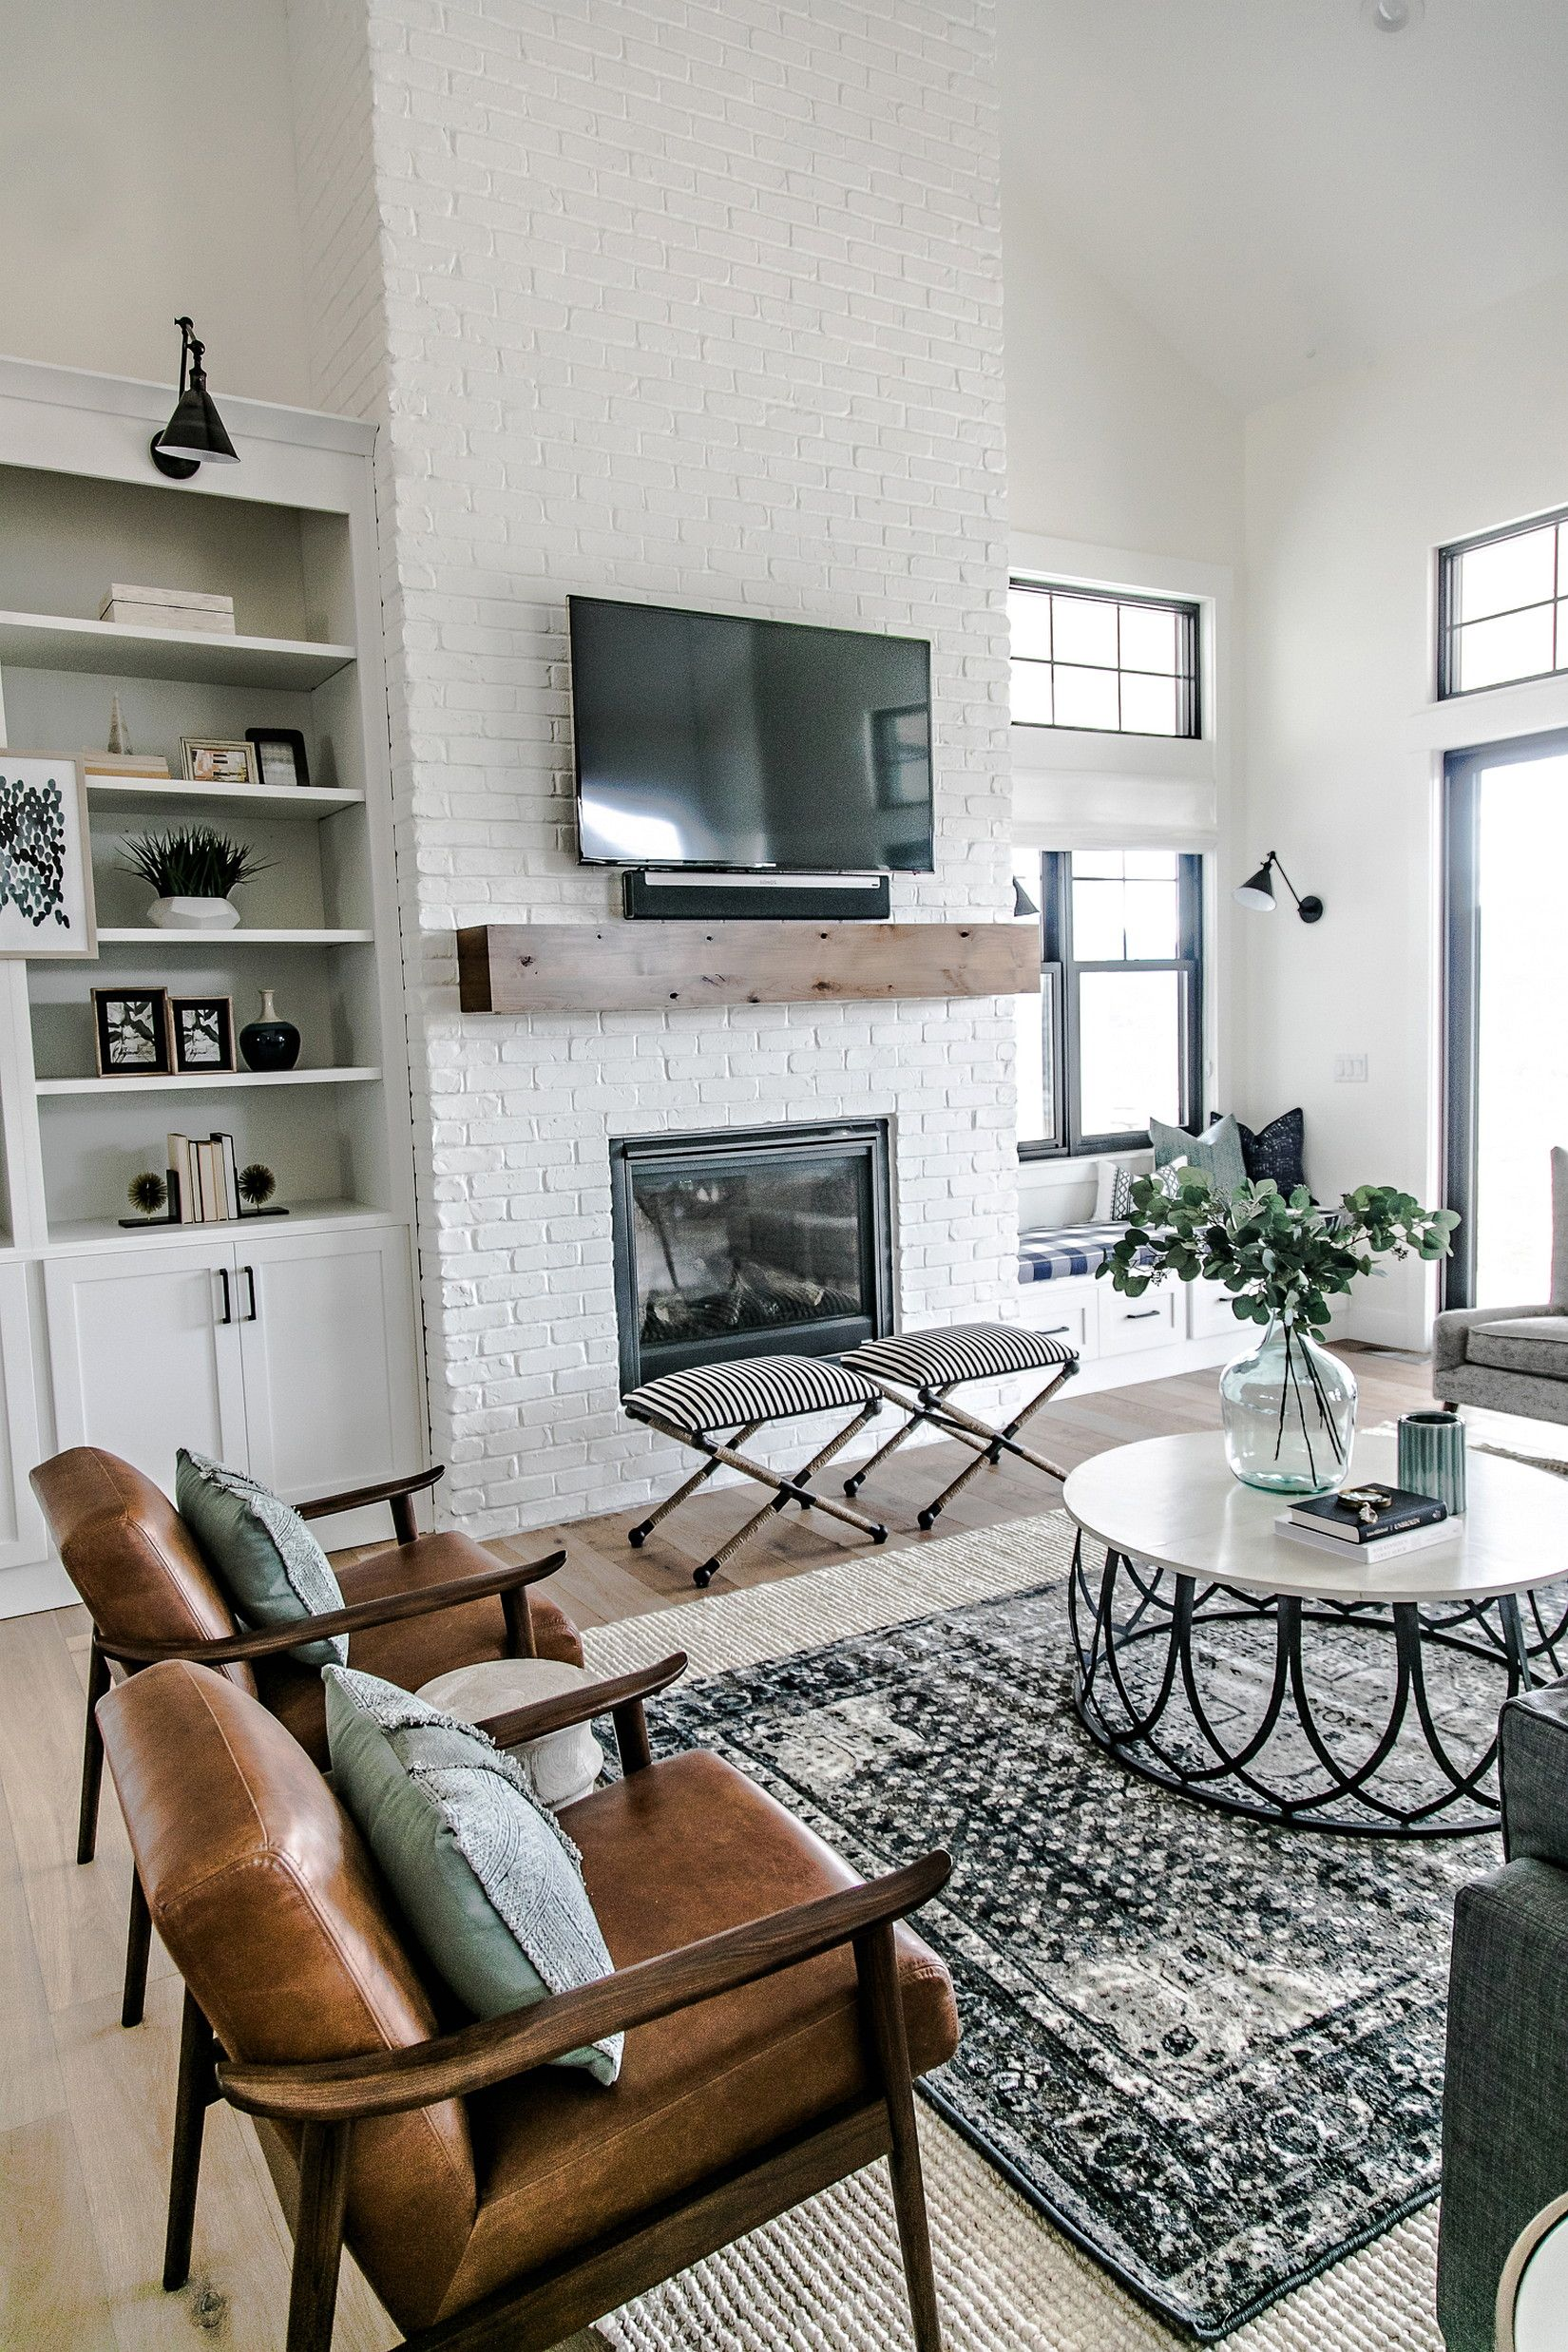 65 fy Modern Farmhouse Living Room Decor Ideas and Designs